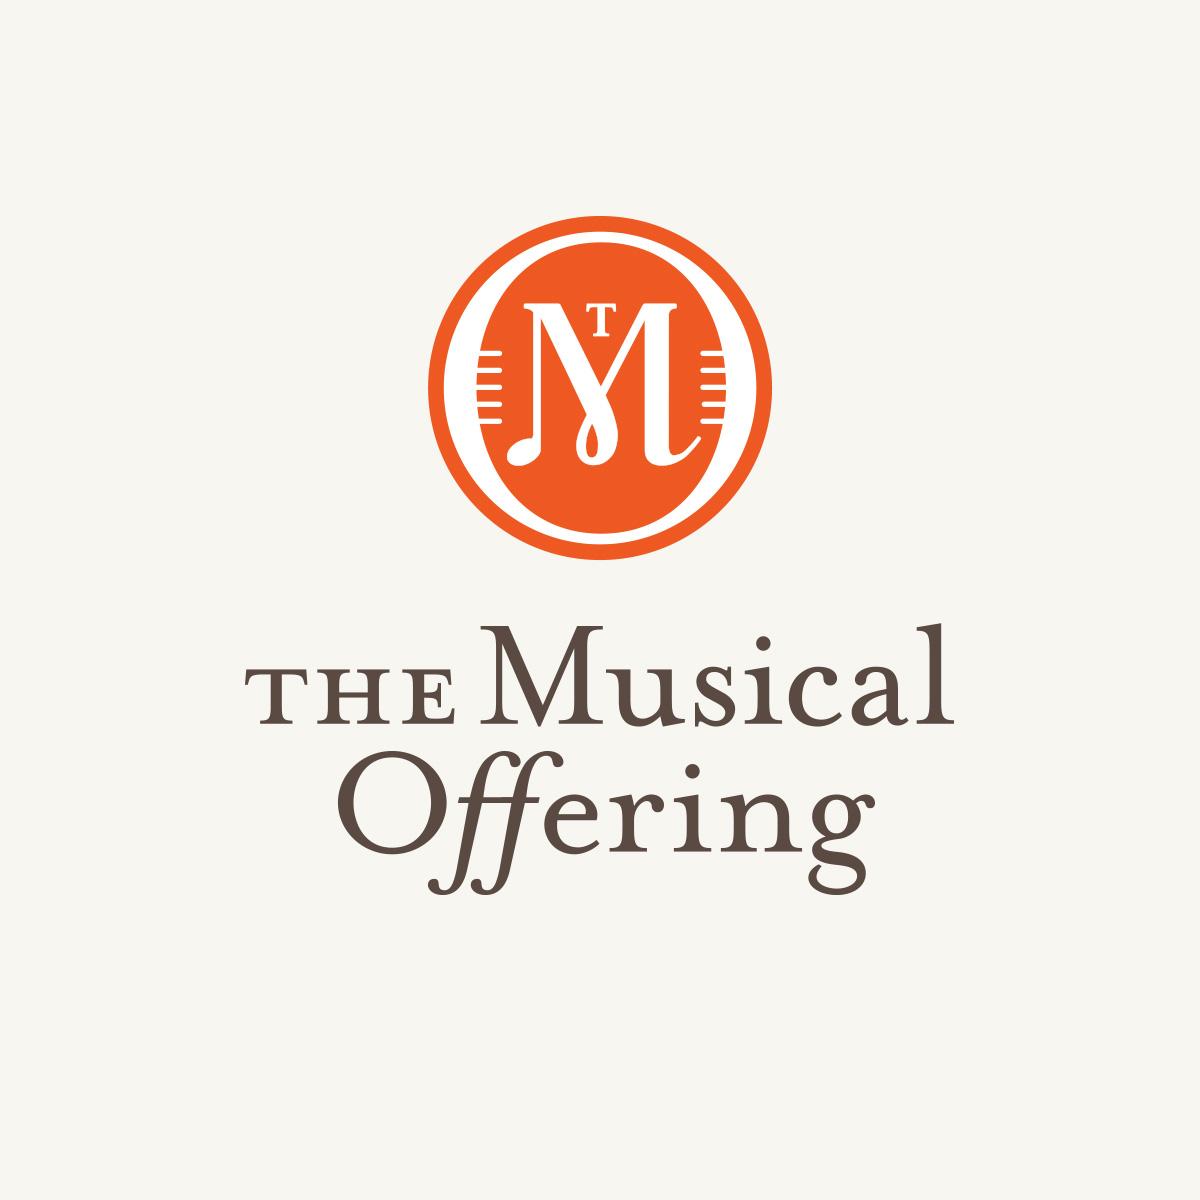 The_Musical_Offering.jpg